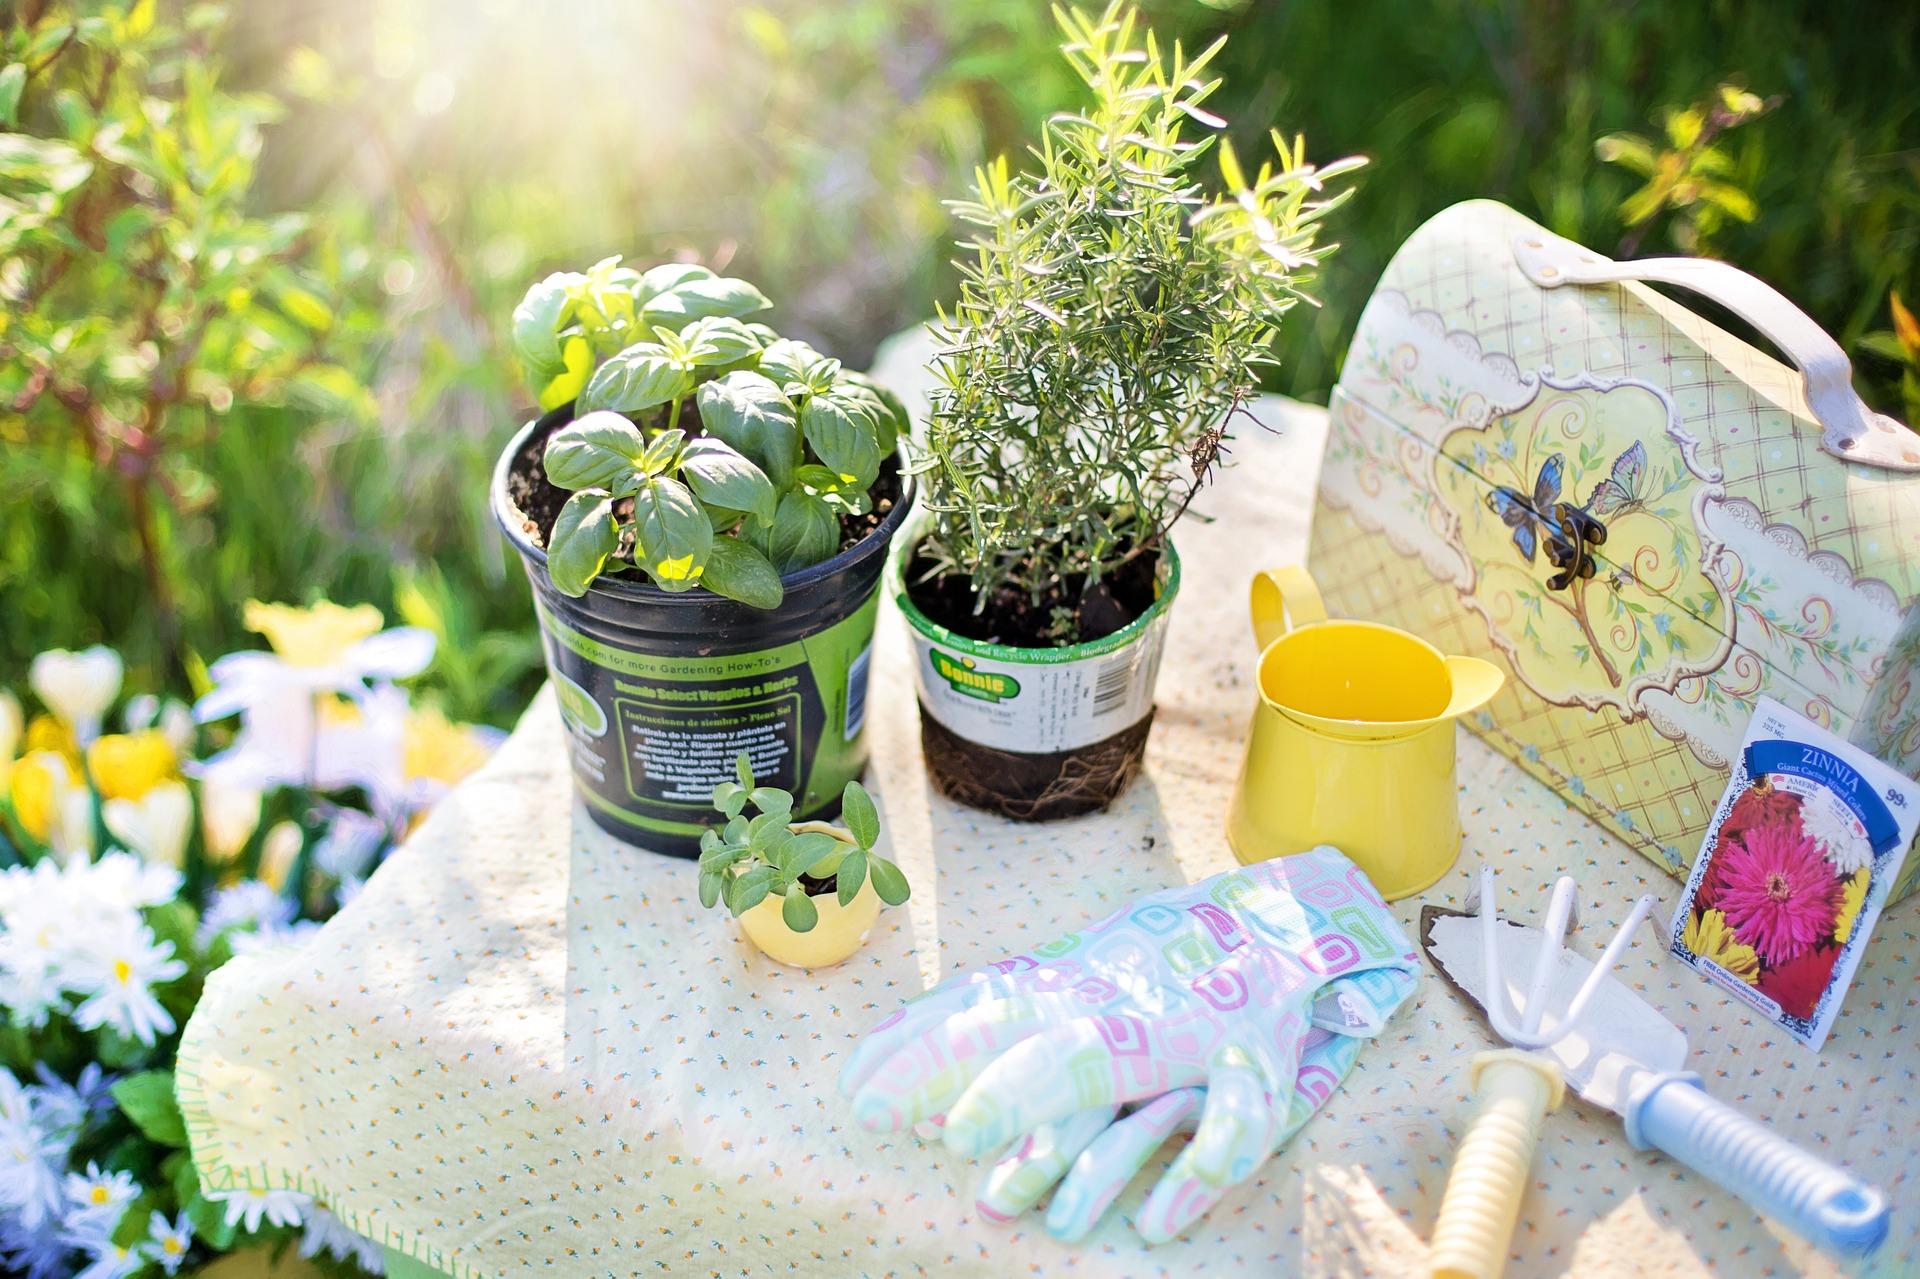 Plant Your Own Vegetable Garden